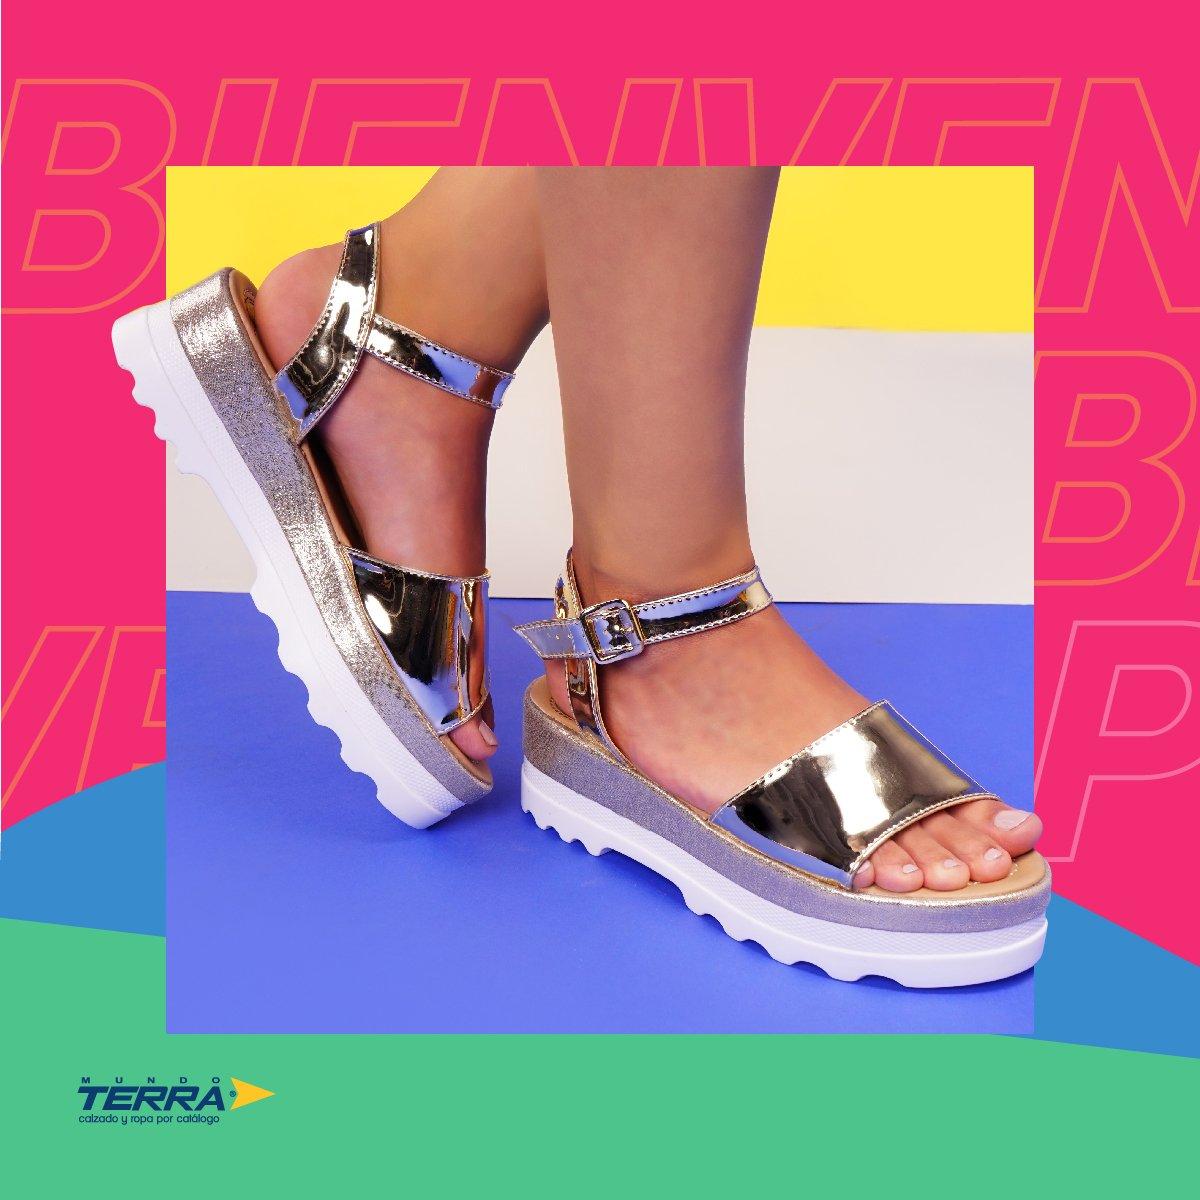 ¡Atrévete a usarlos! Los zapatos dorados están en tendencia esta temporada.  #mundoterra #shoes #loveshoes #primavera #zapatos #fashion #moda https://t.co/Es441FGkeY